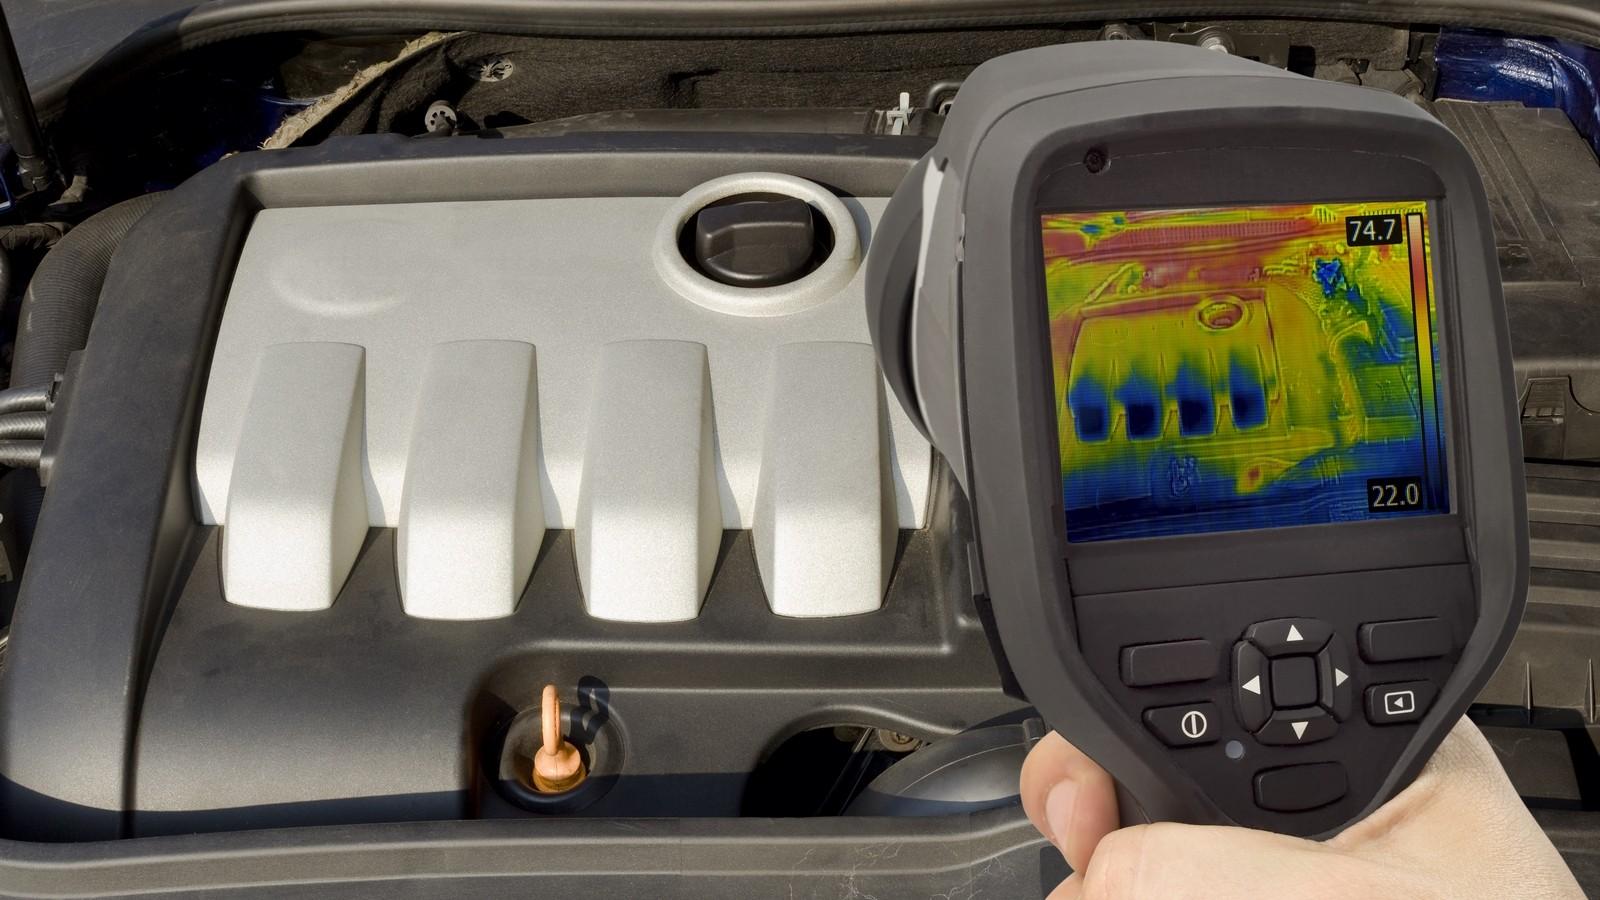 Engine Thermal Image